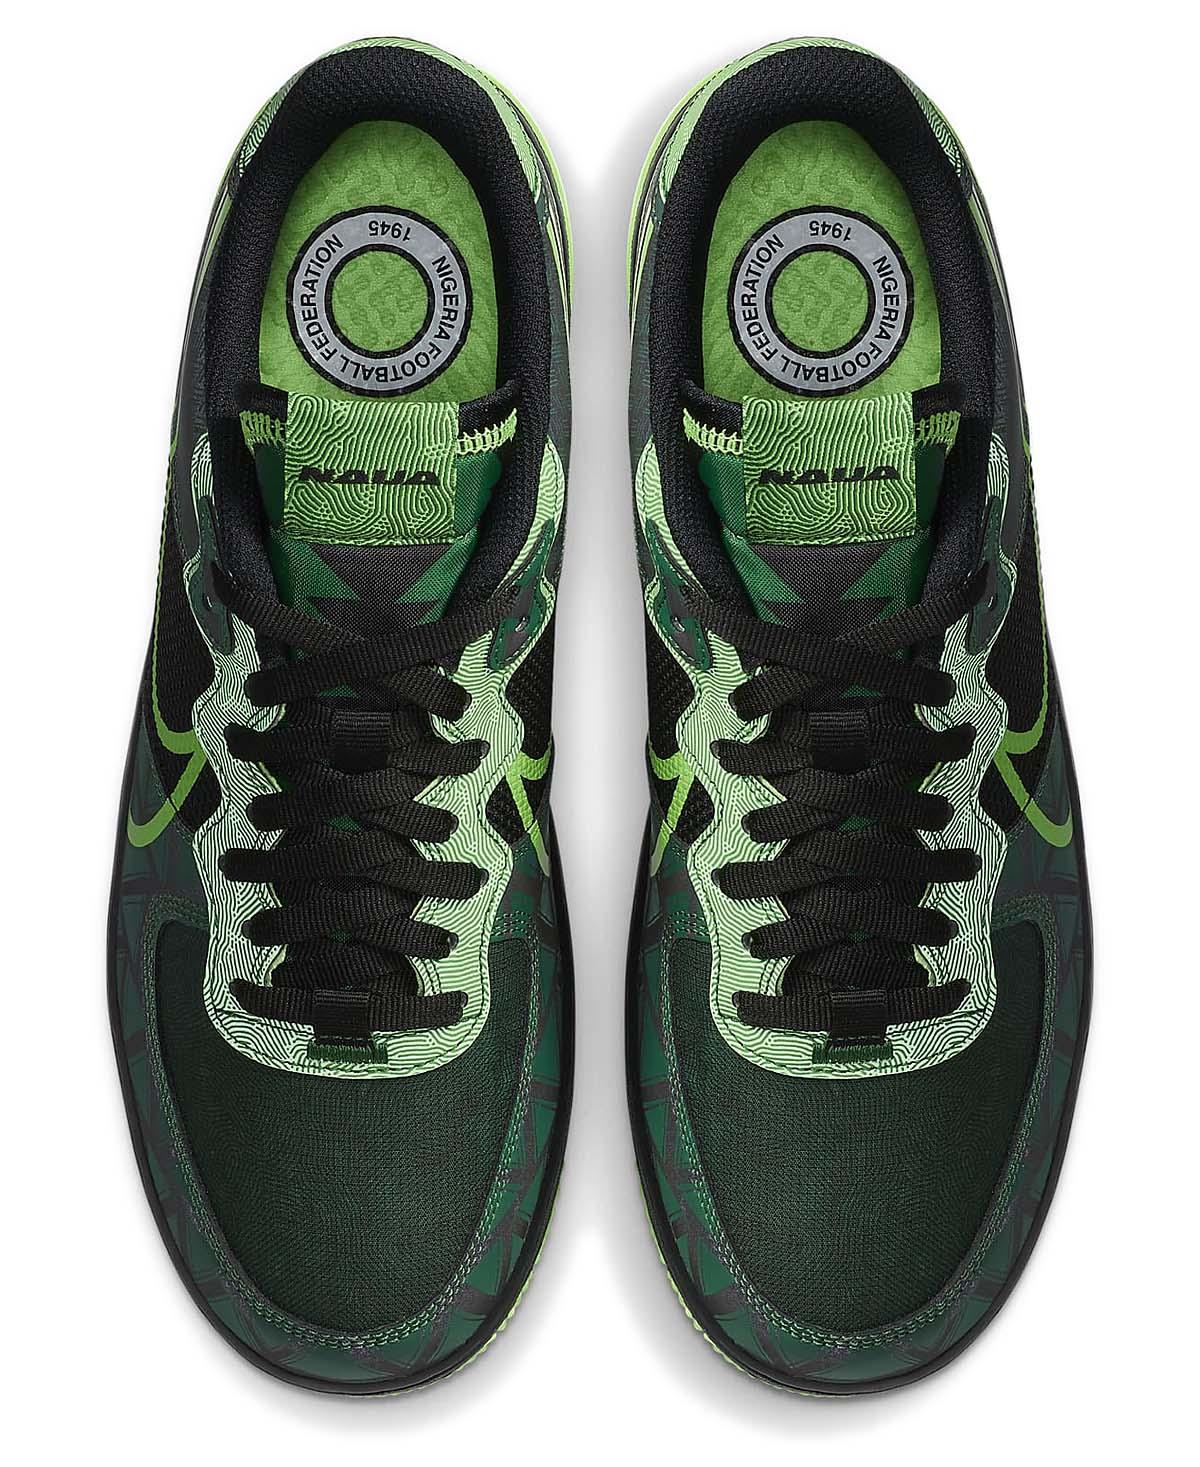 NIKE AIR FORCE 1 REACT QS NAIJA BLACK / GREEN STRIKE-PINE GREEN CW3918-001 ナイキ エアフォース1 リアクト QS ナイジェリア ブラック/グリーン